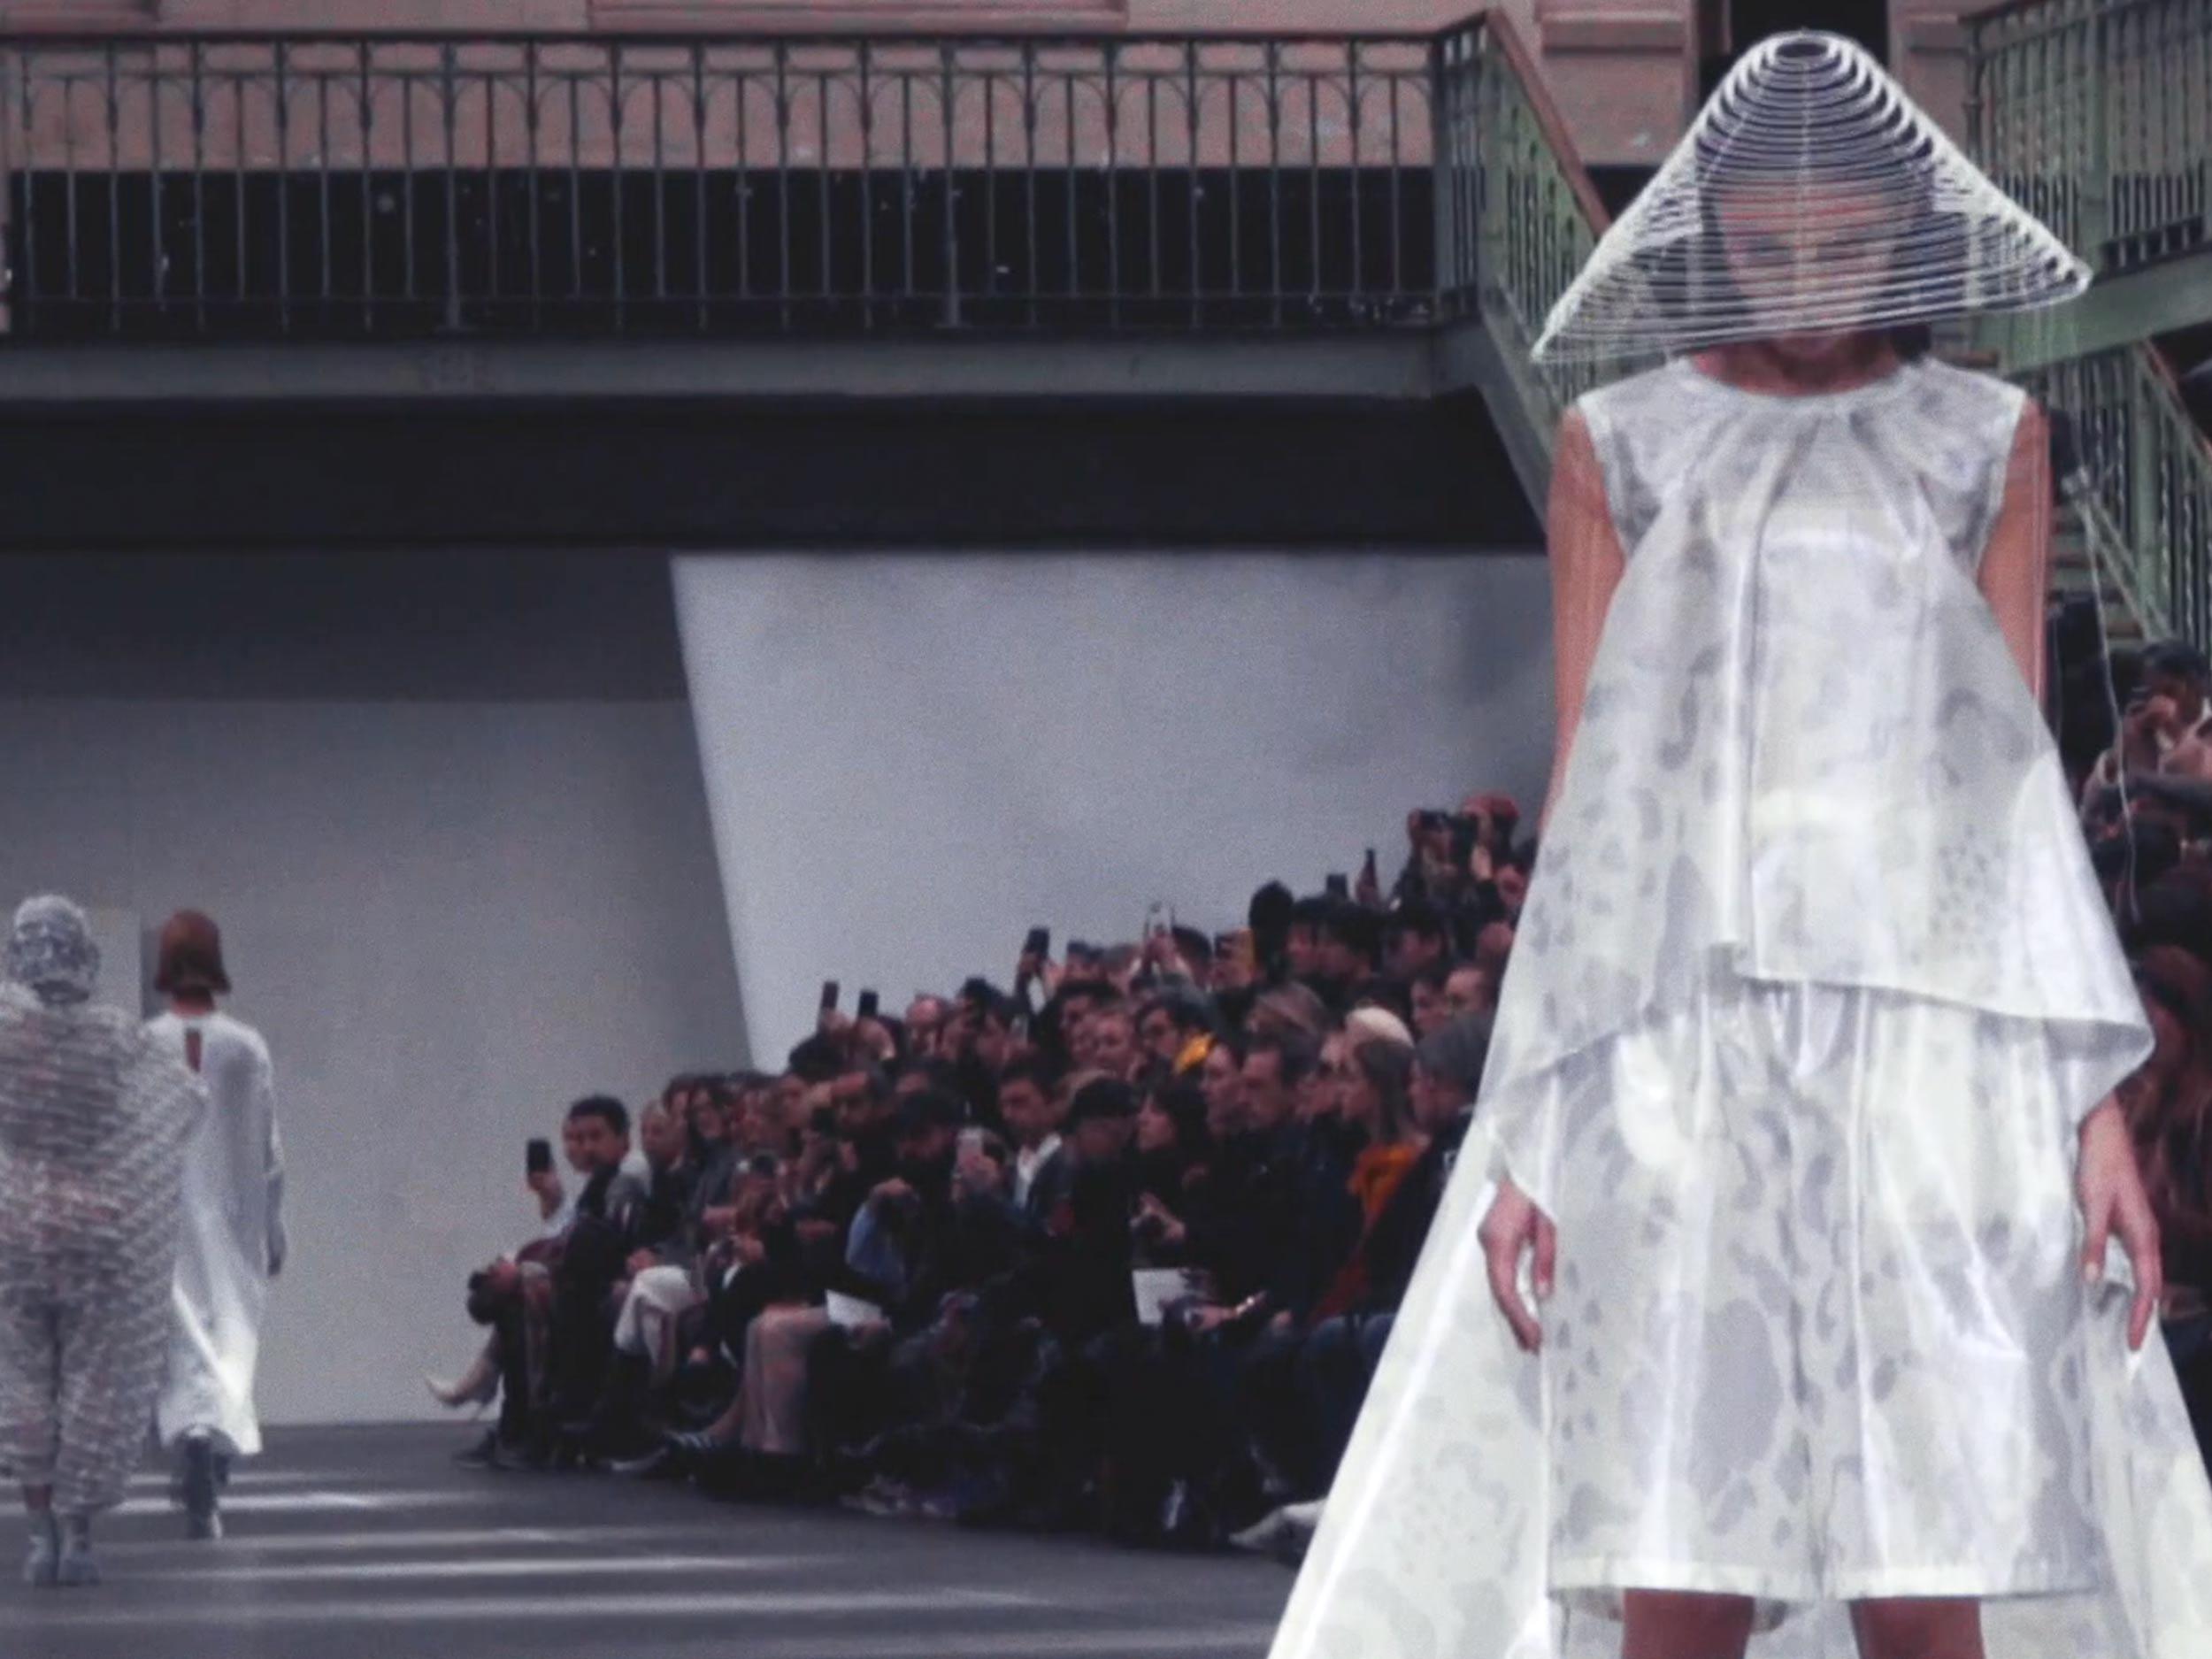 See Issey Miyake's future geometries in motion